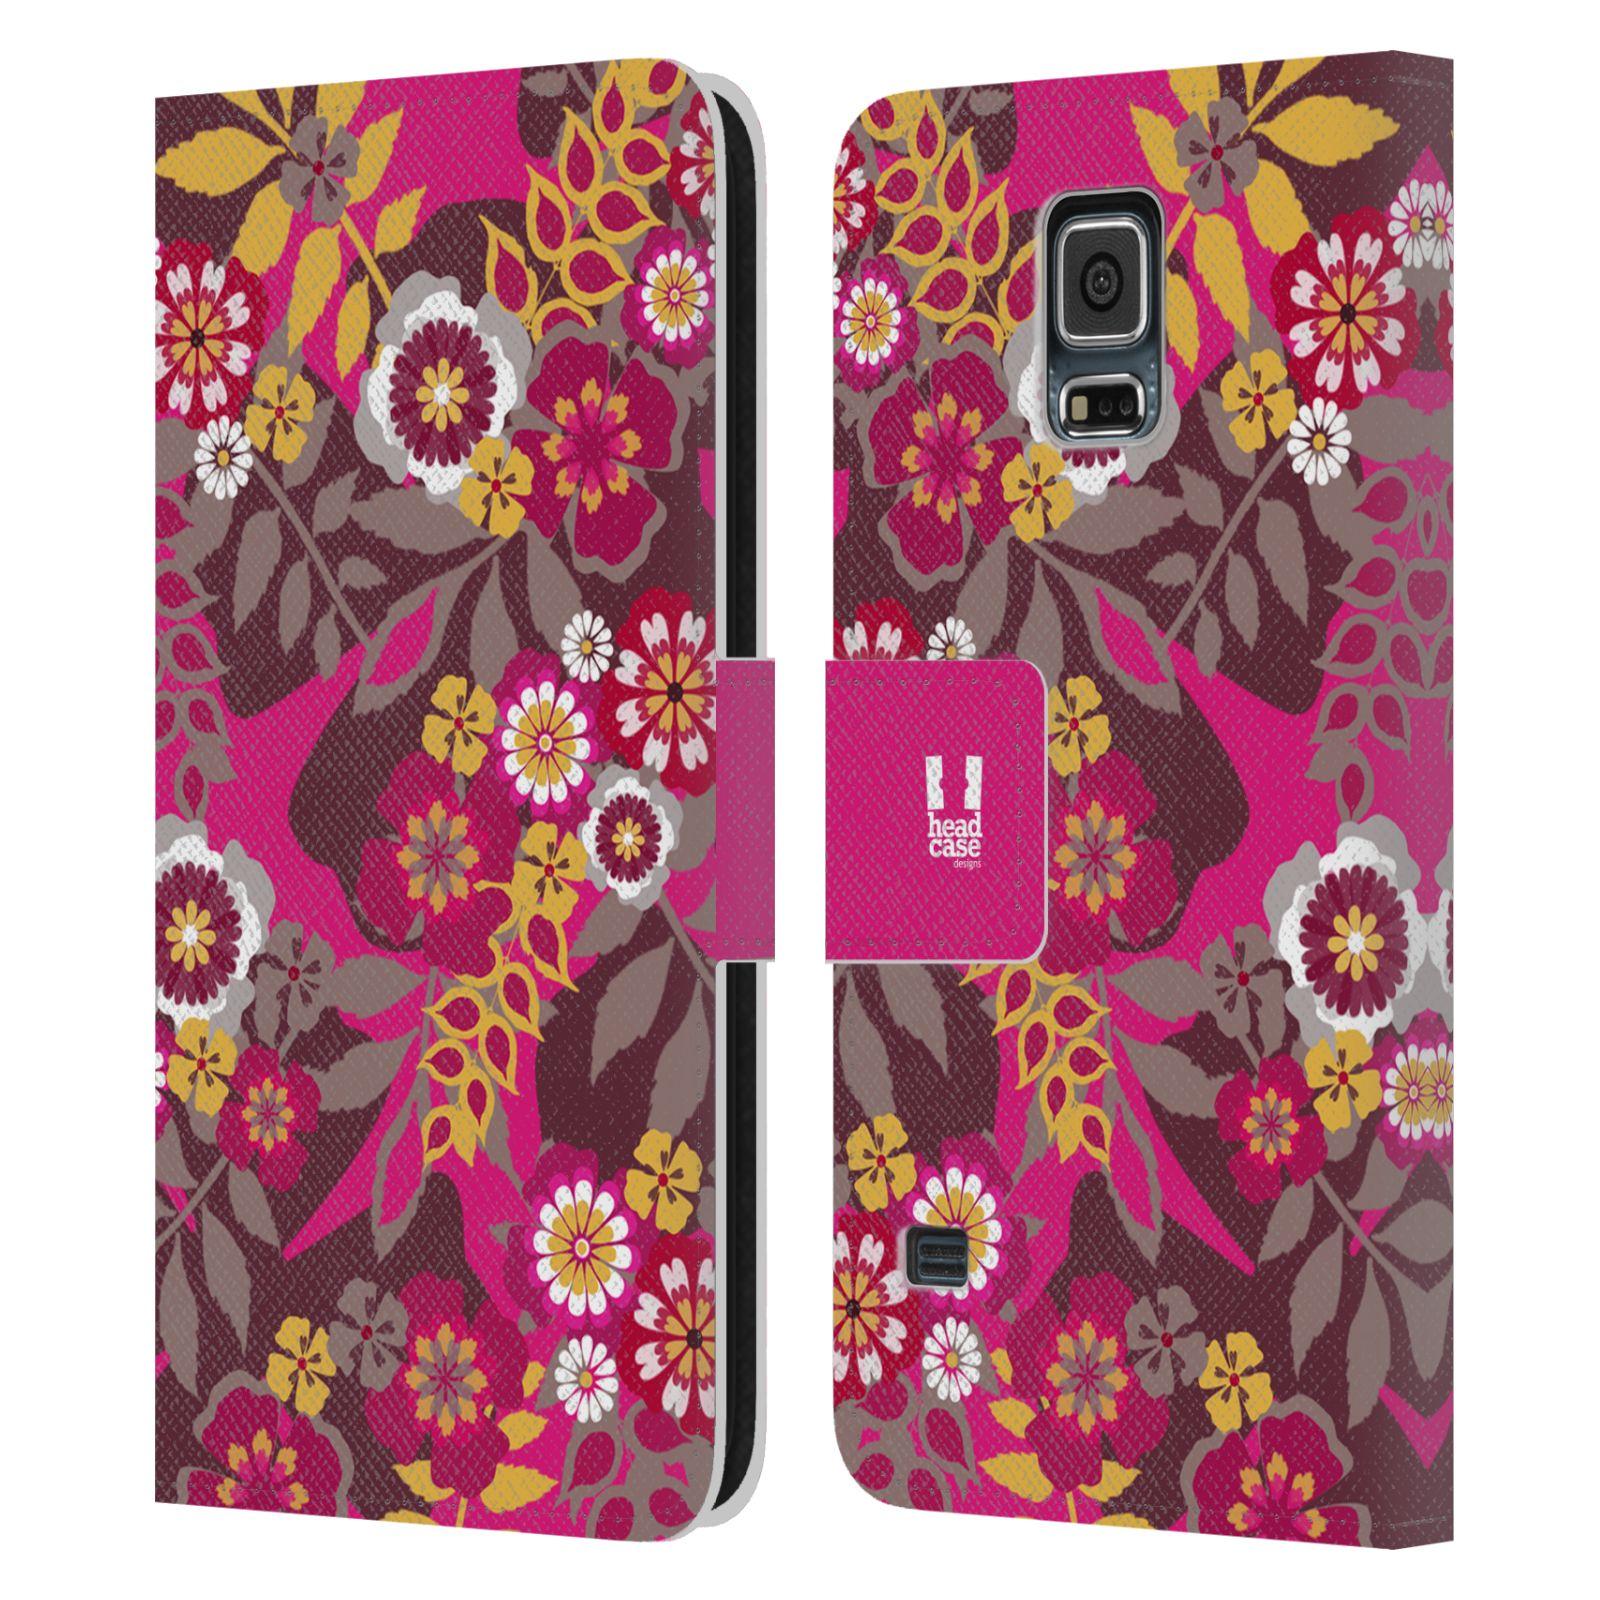 HEAD CASE Flipové pouzdro pro mobil Samsung Galaxy S5 / S5 NEO BOTANIKA růžová a hnědá